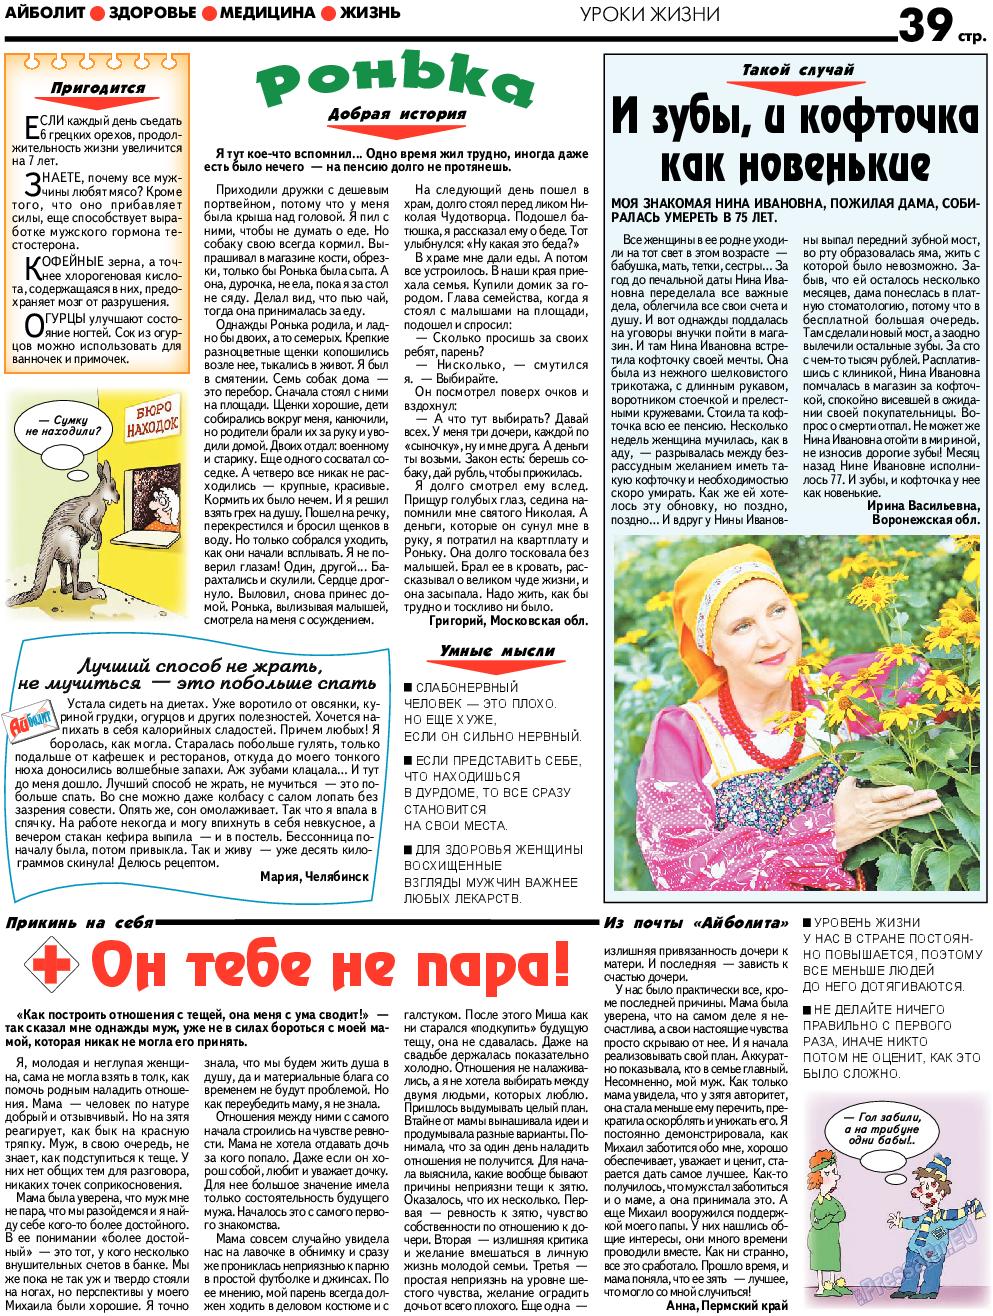 АйБолит (газета). 2018 год, номер 6, стр. 39